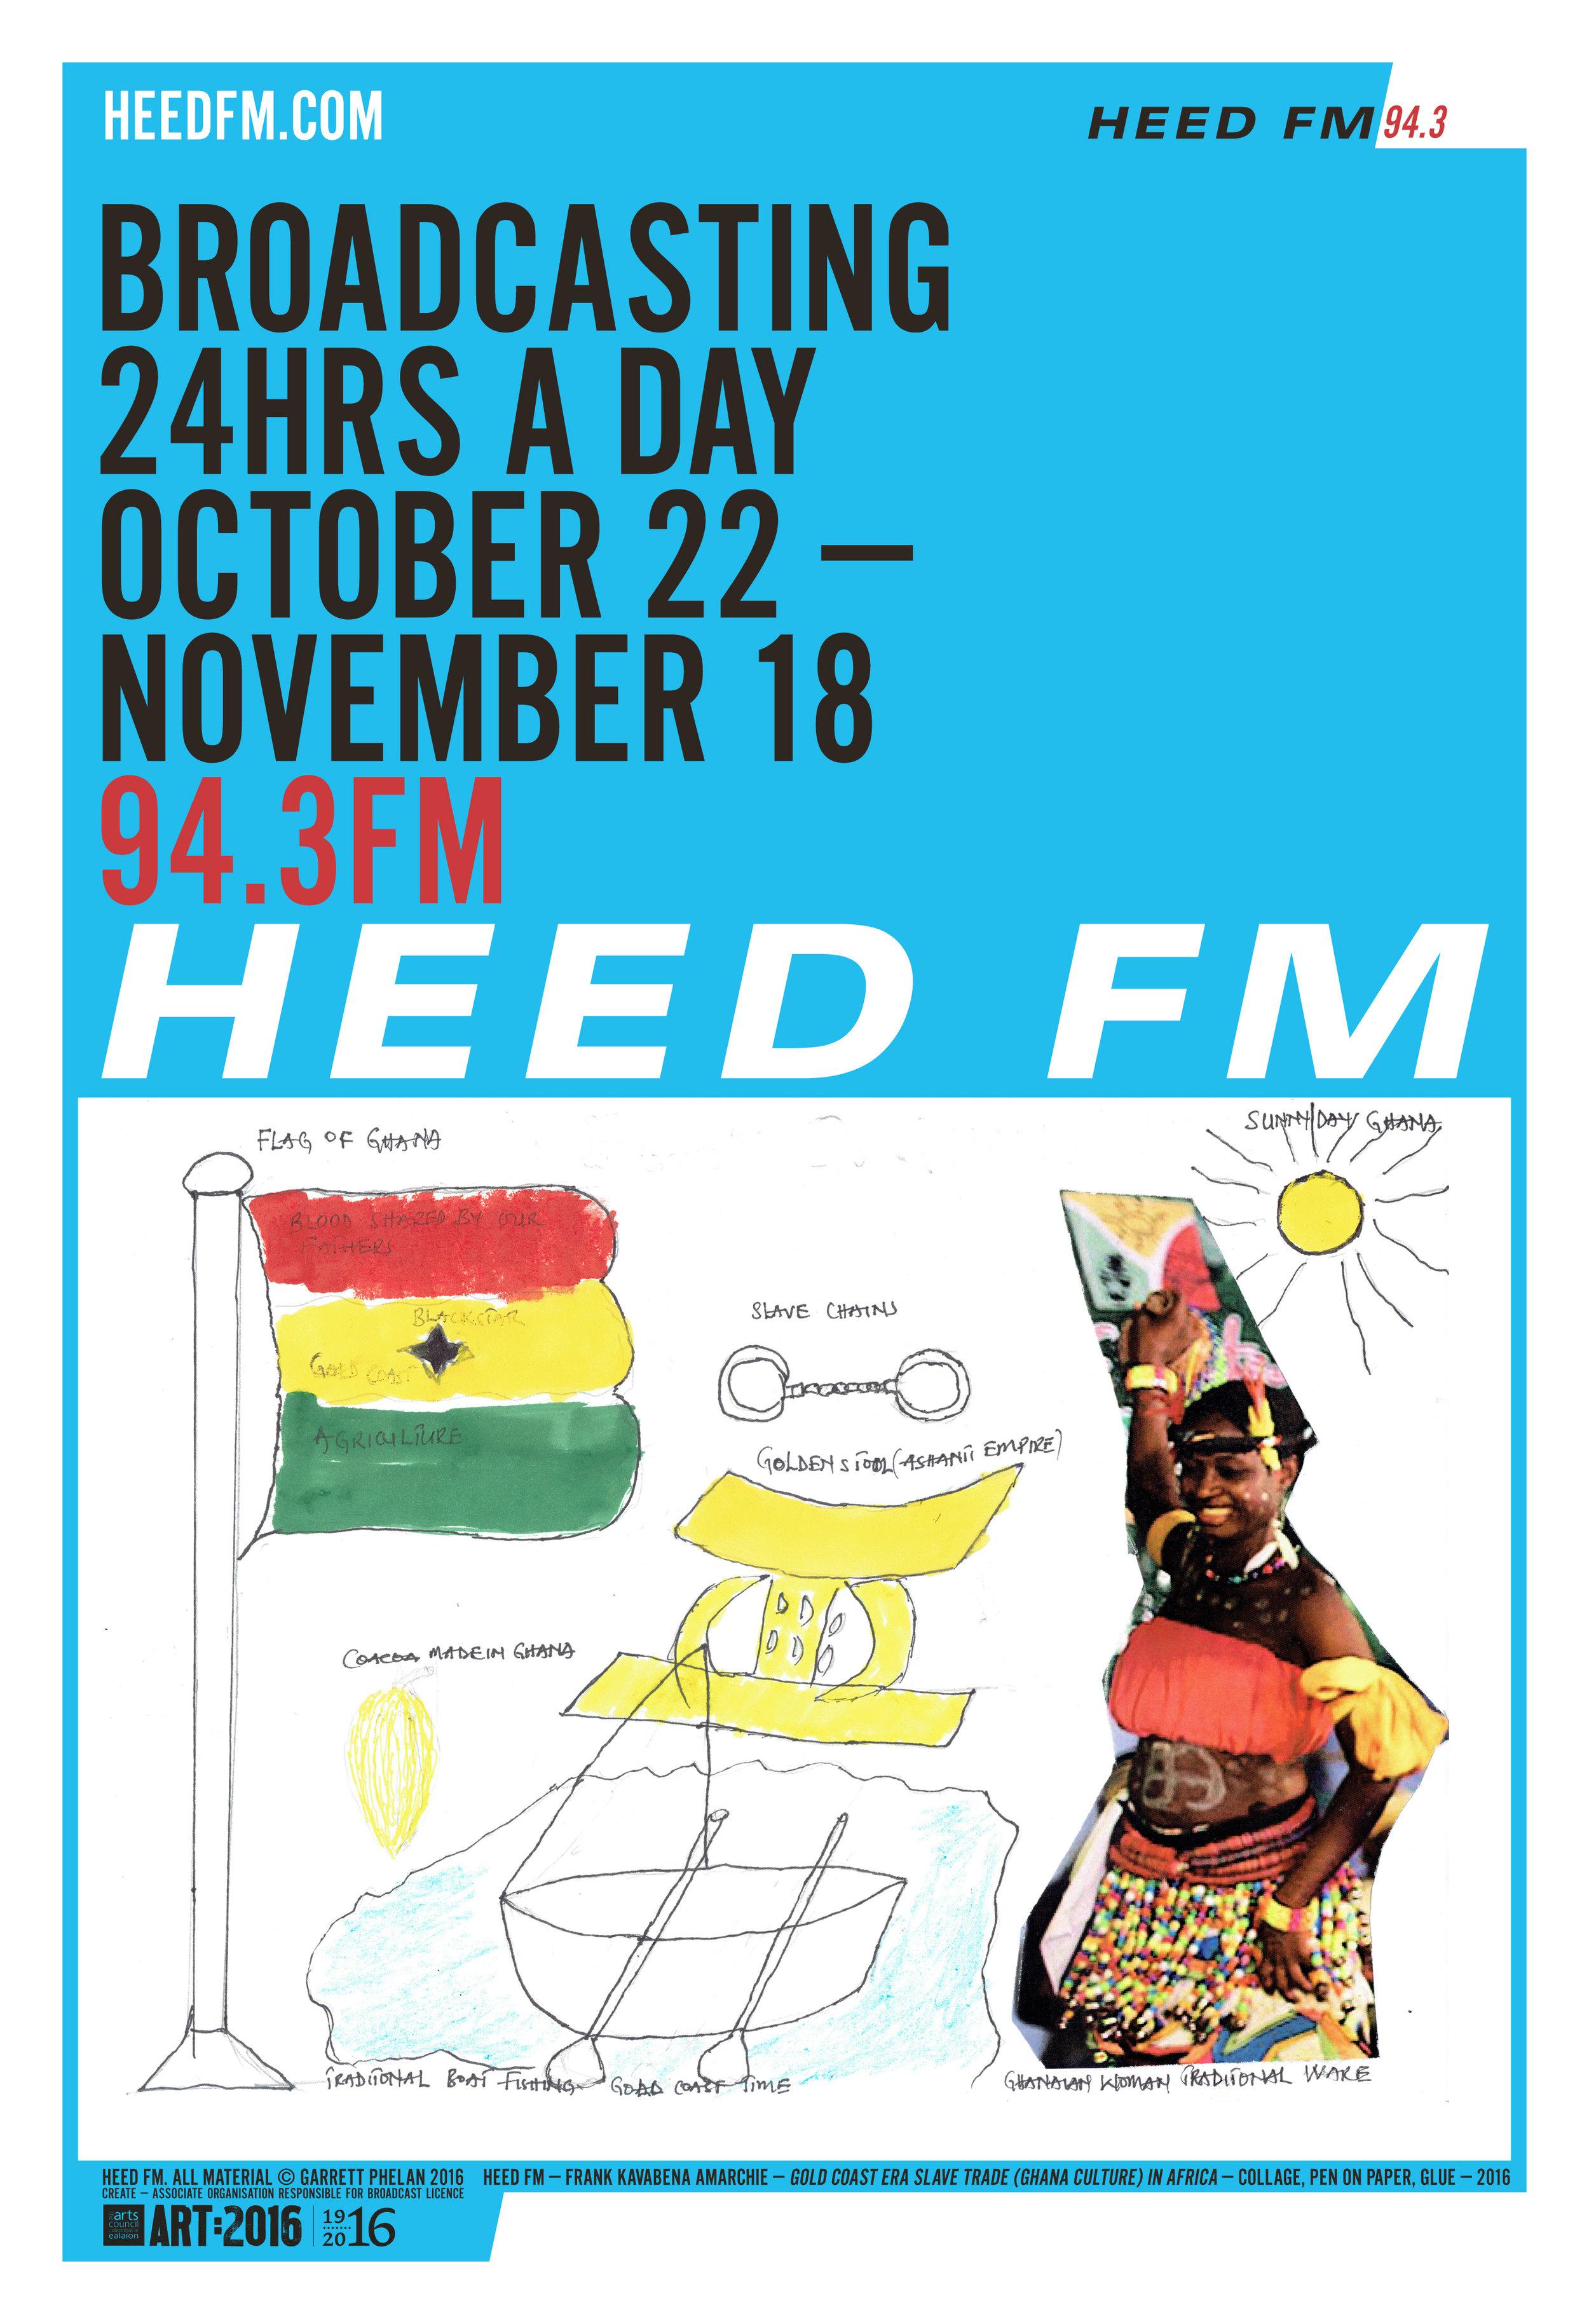 heed fm 4 sheets artwork-14.jpg